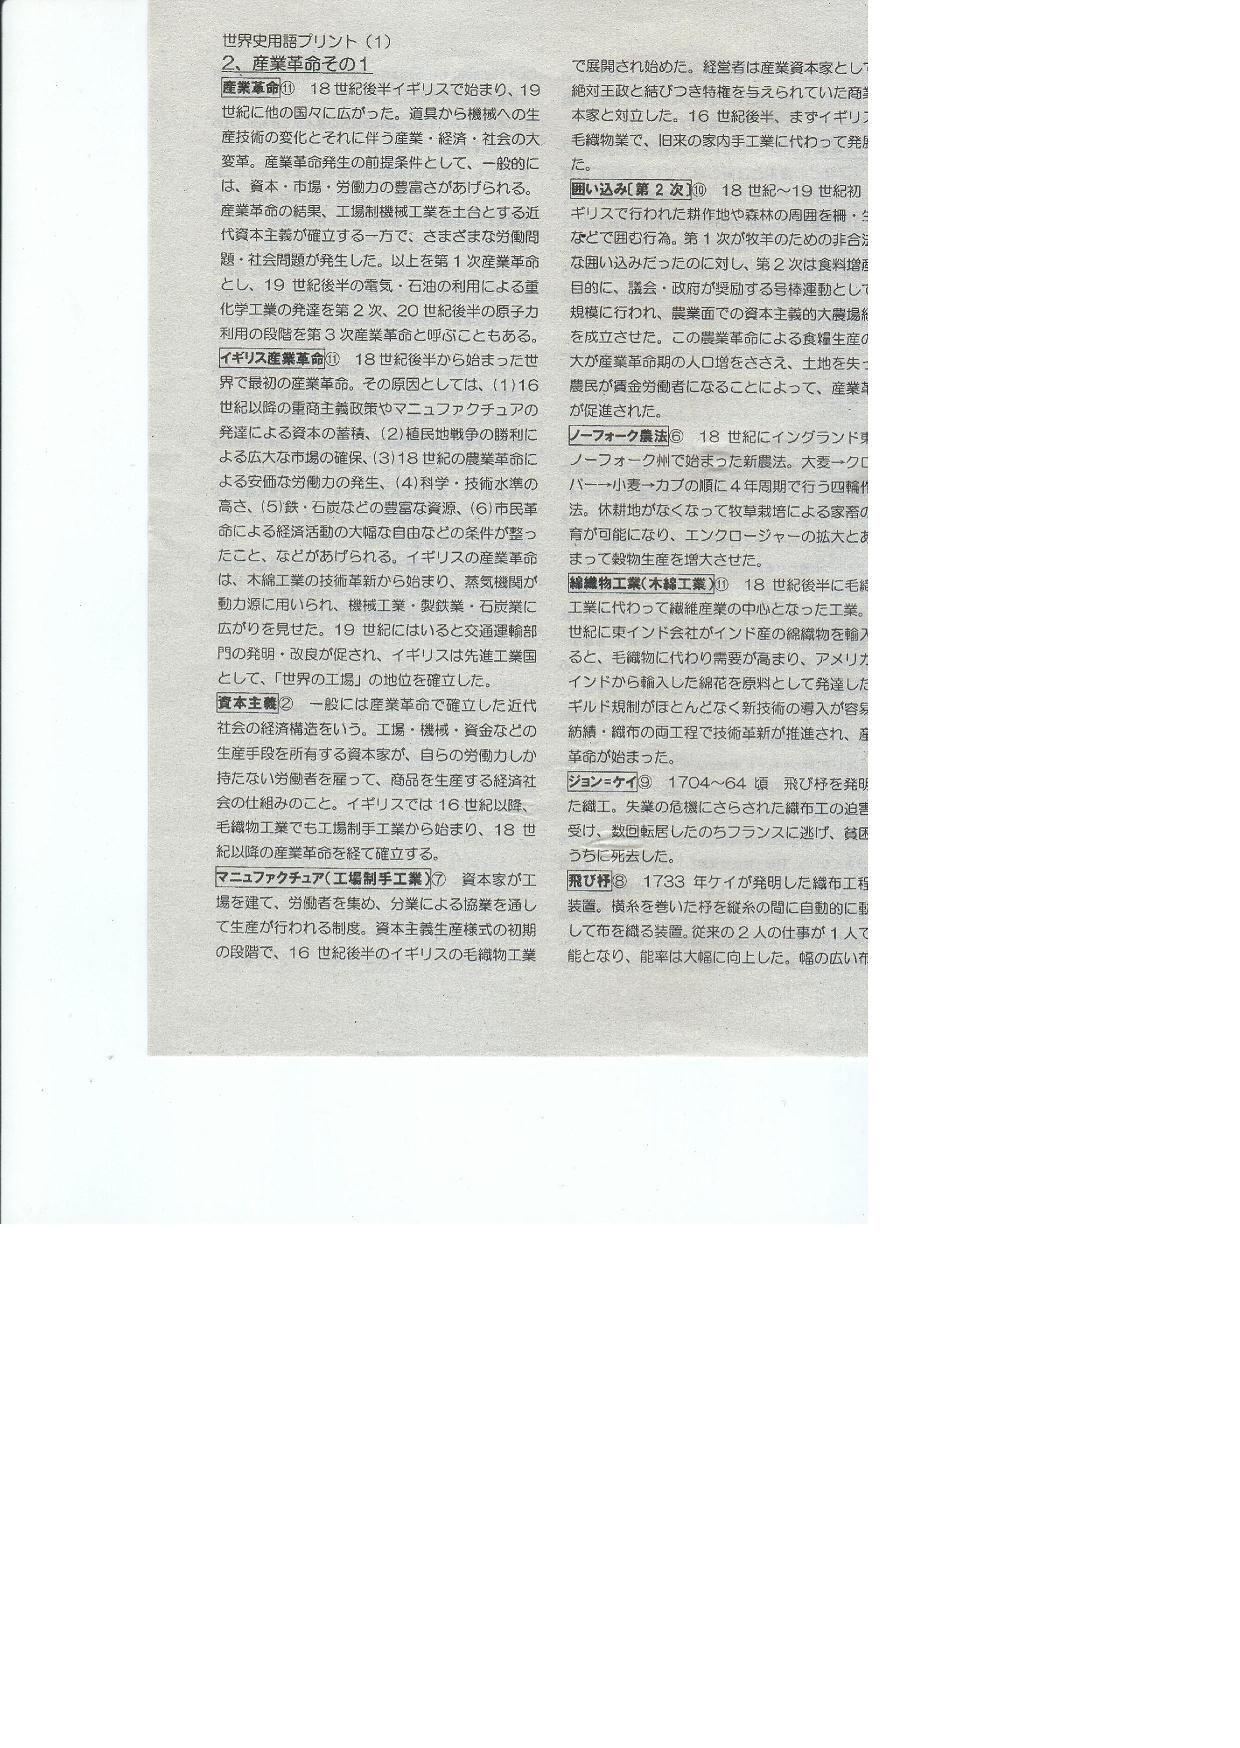 SAVE0154.jpg